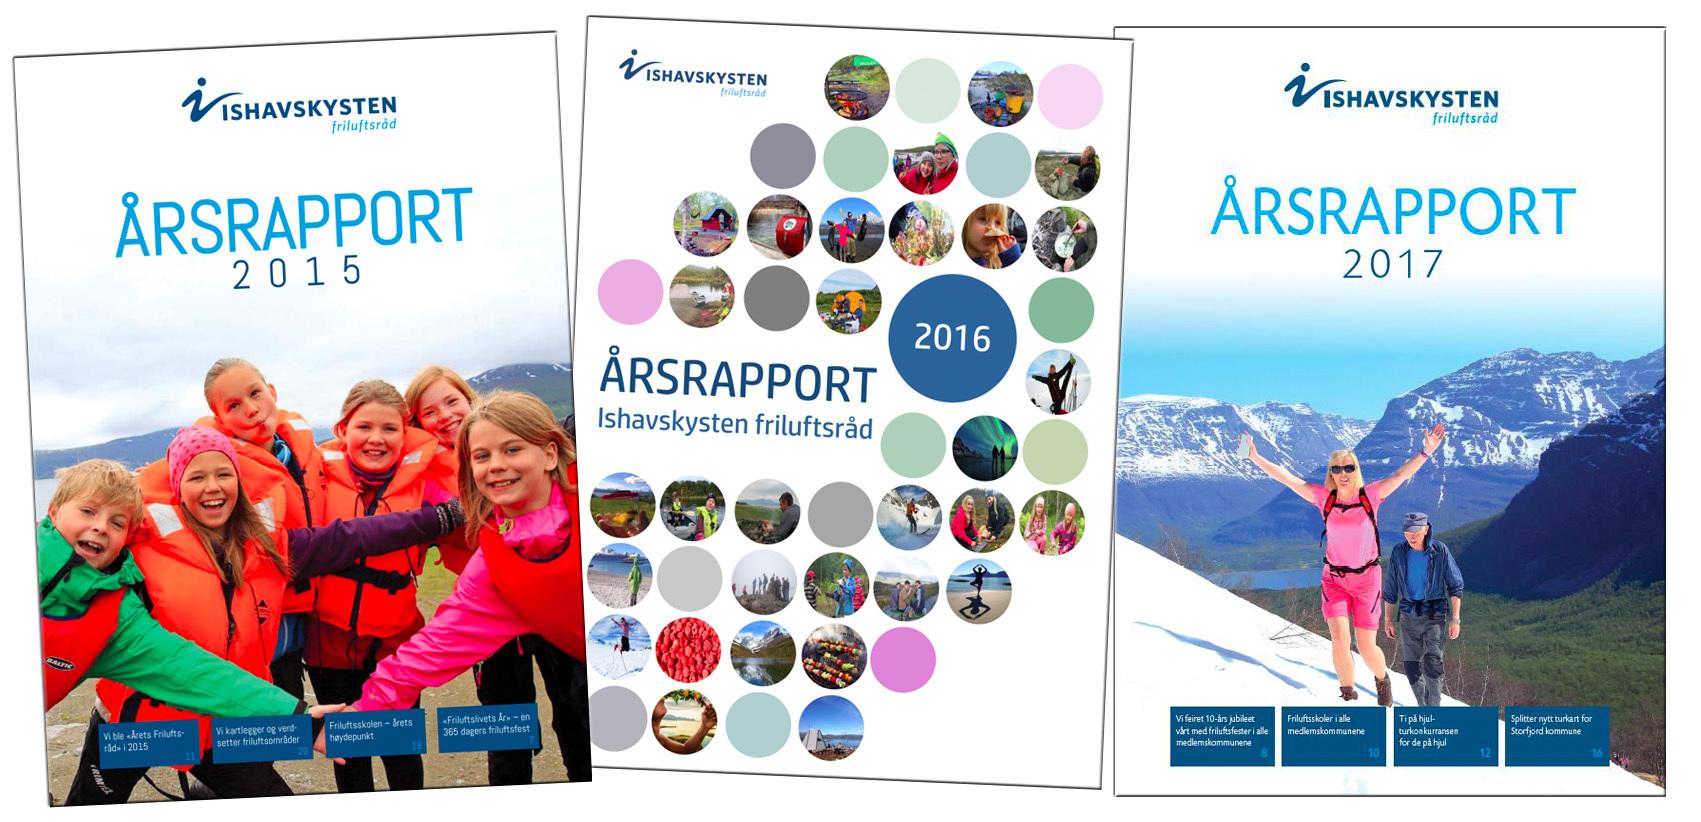 årsrapporter 2015 2016 2017 forsider.jpg